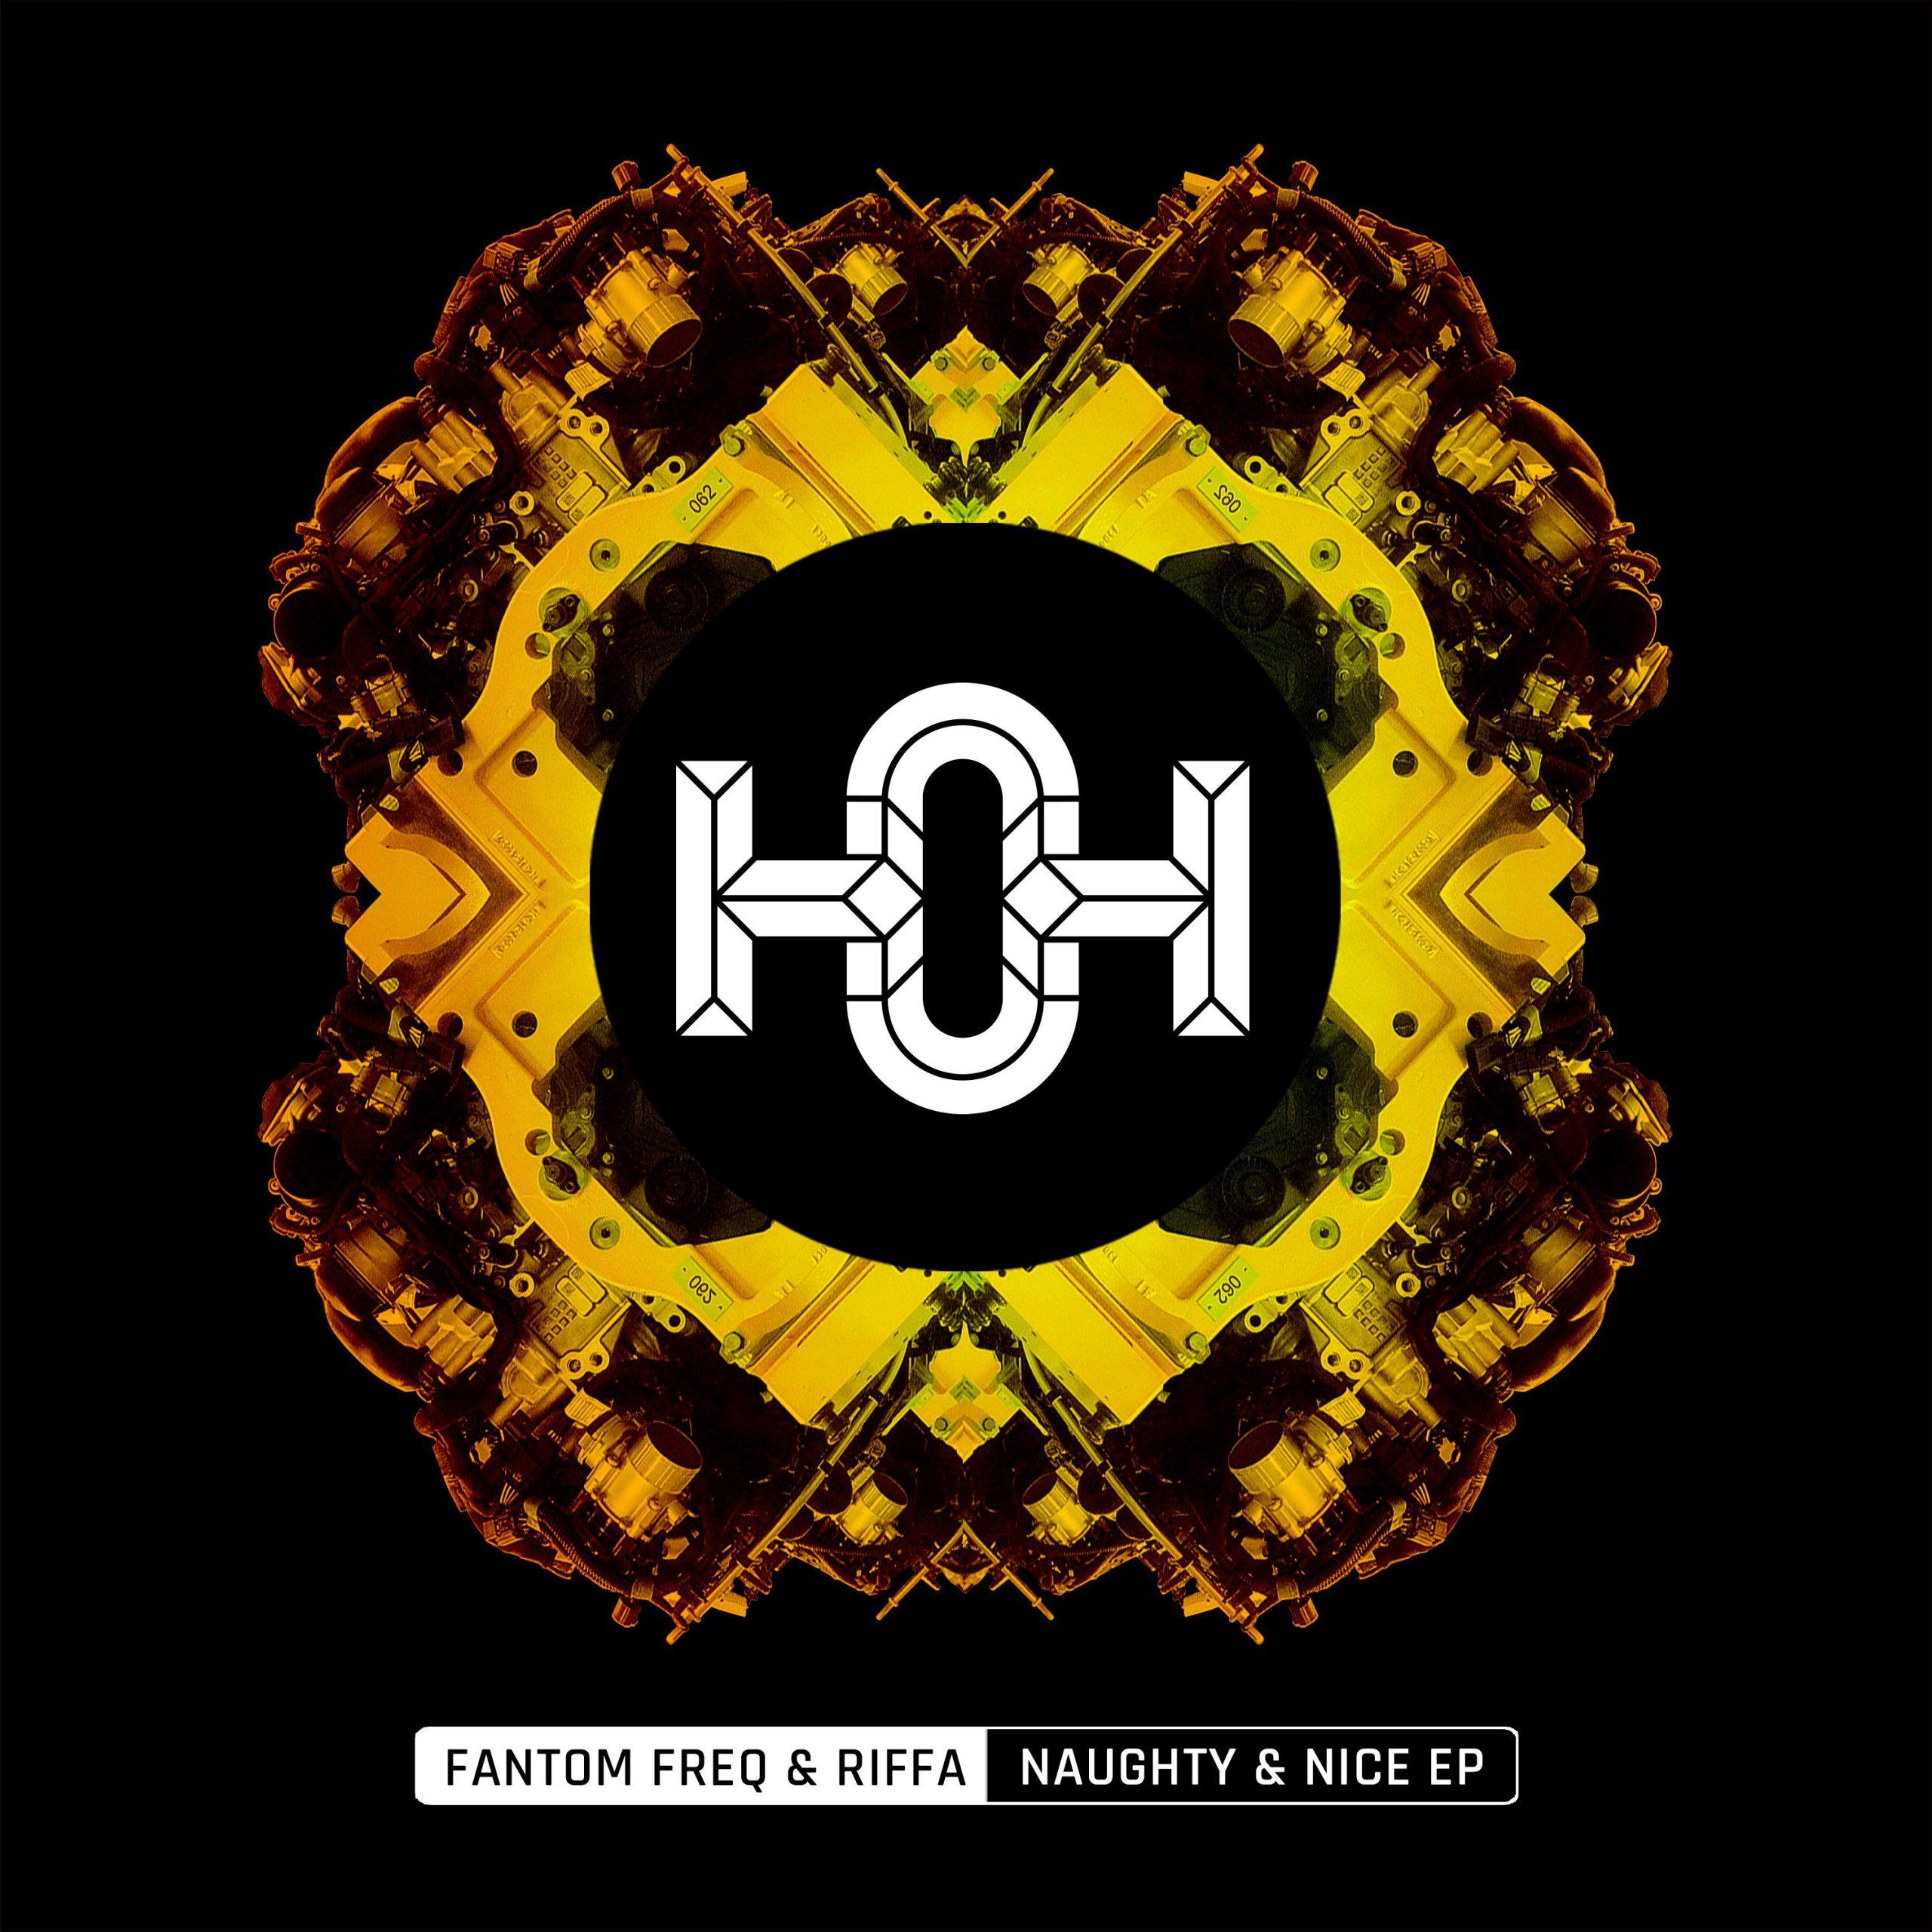 Fantom Freq & Riffa -Naughty & NiceEP